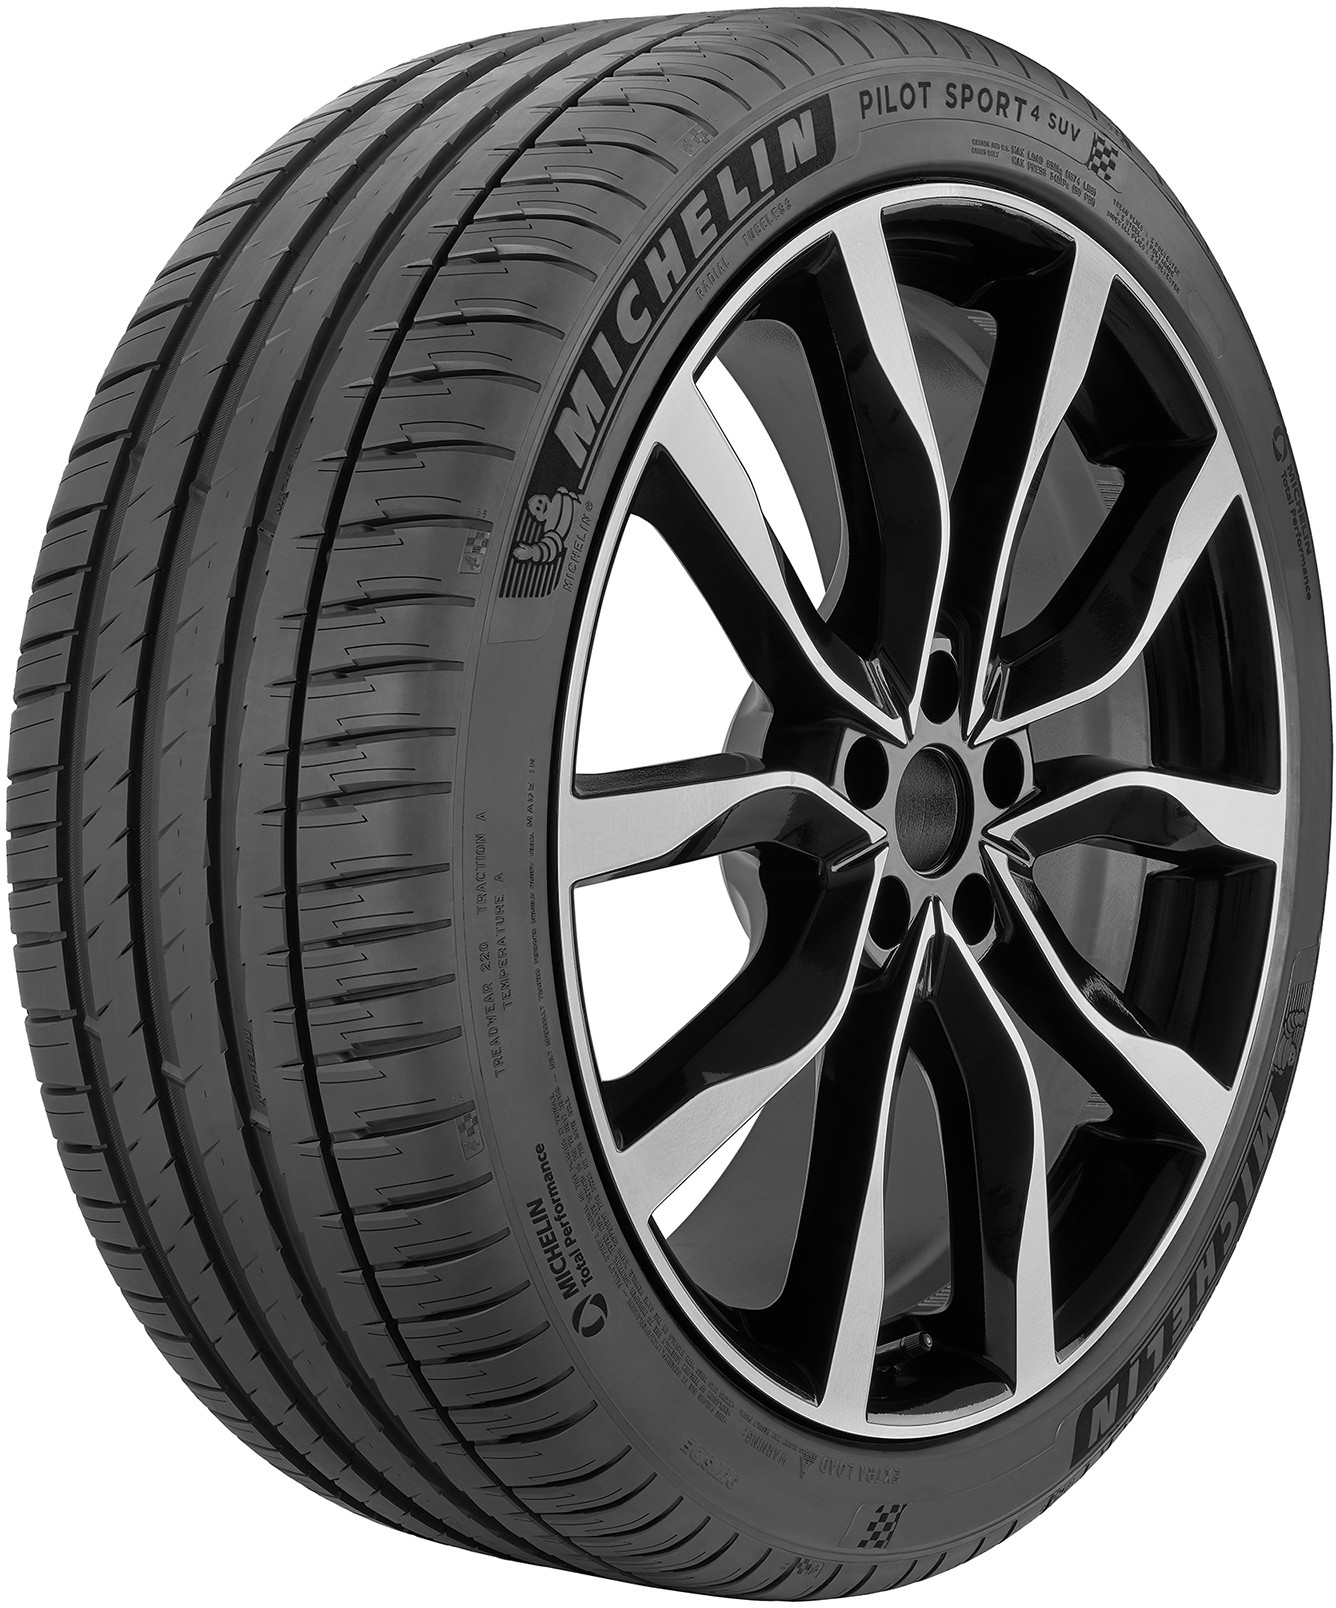 Michelin Pilot Sport 4 SUV 275/40R22 108Y